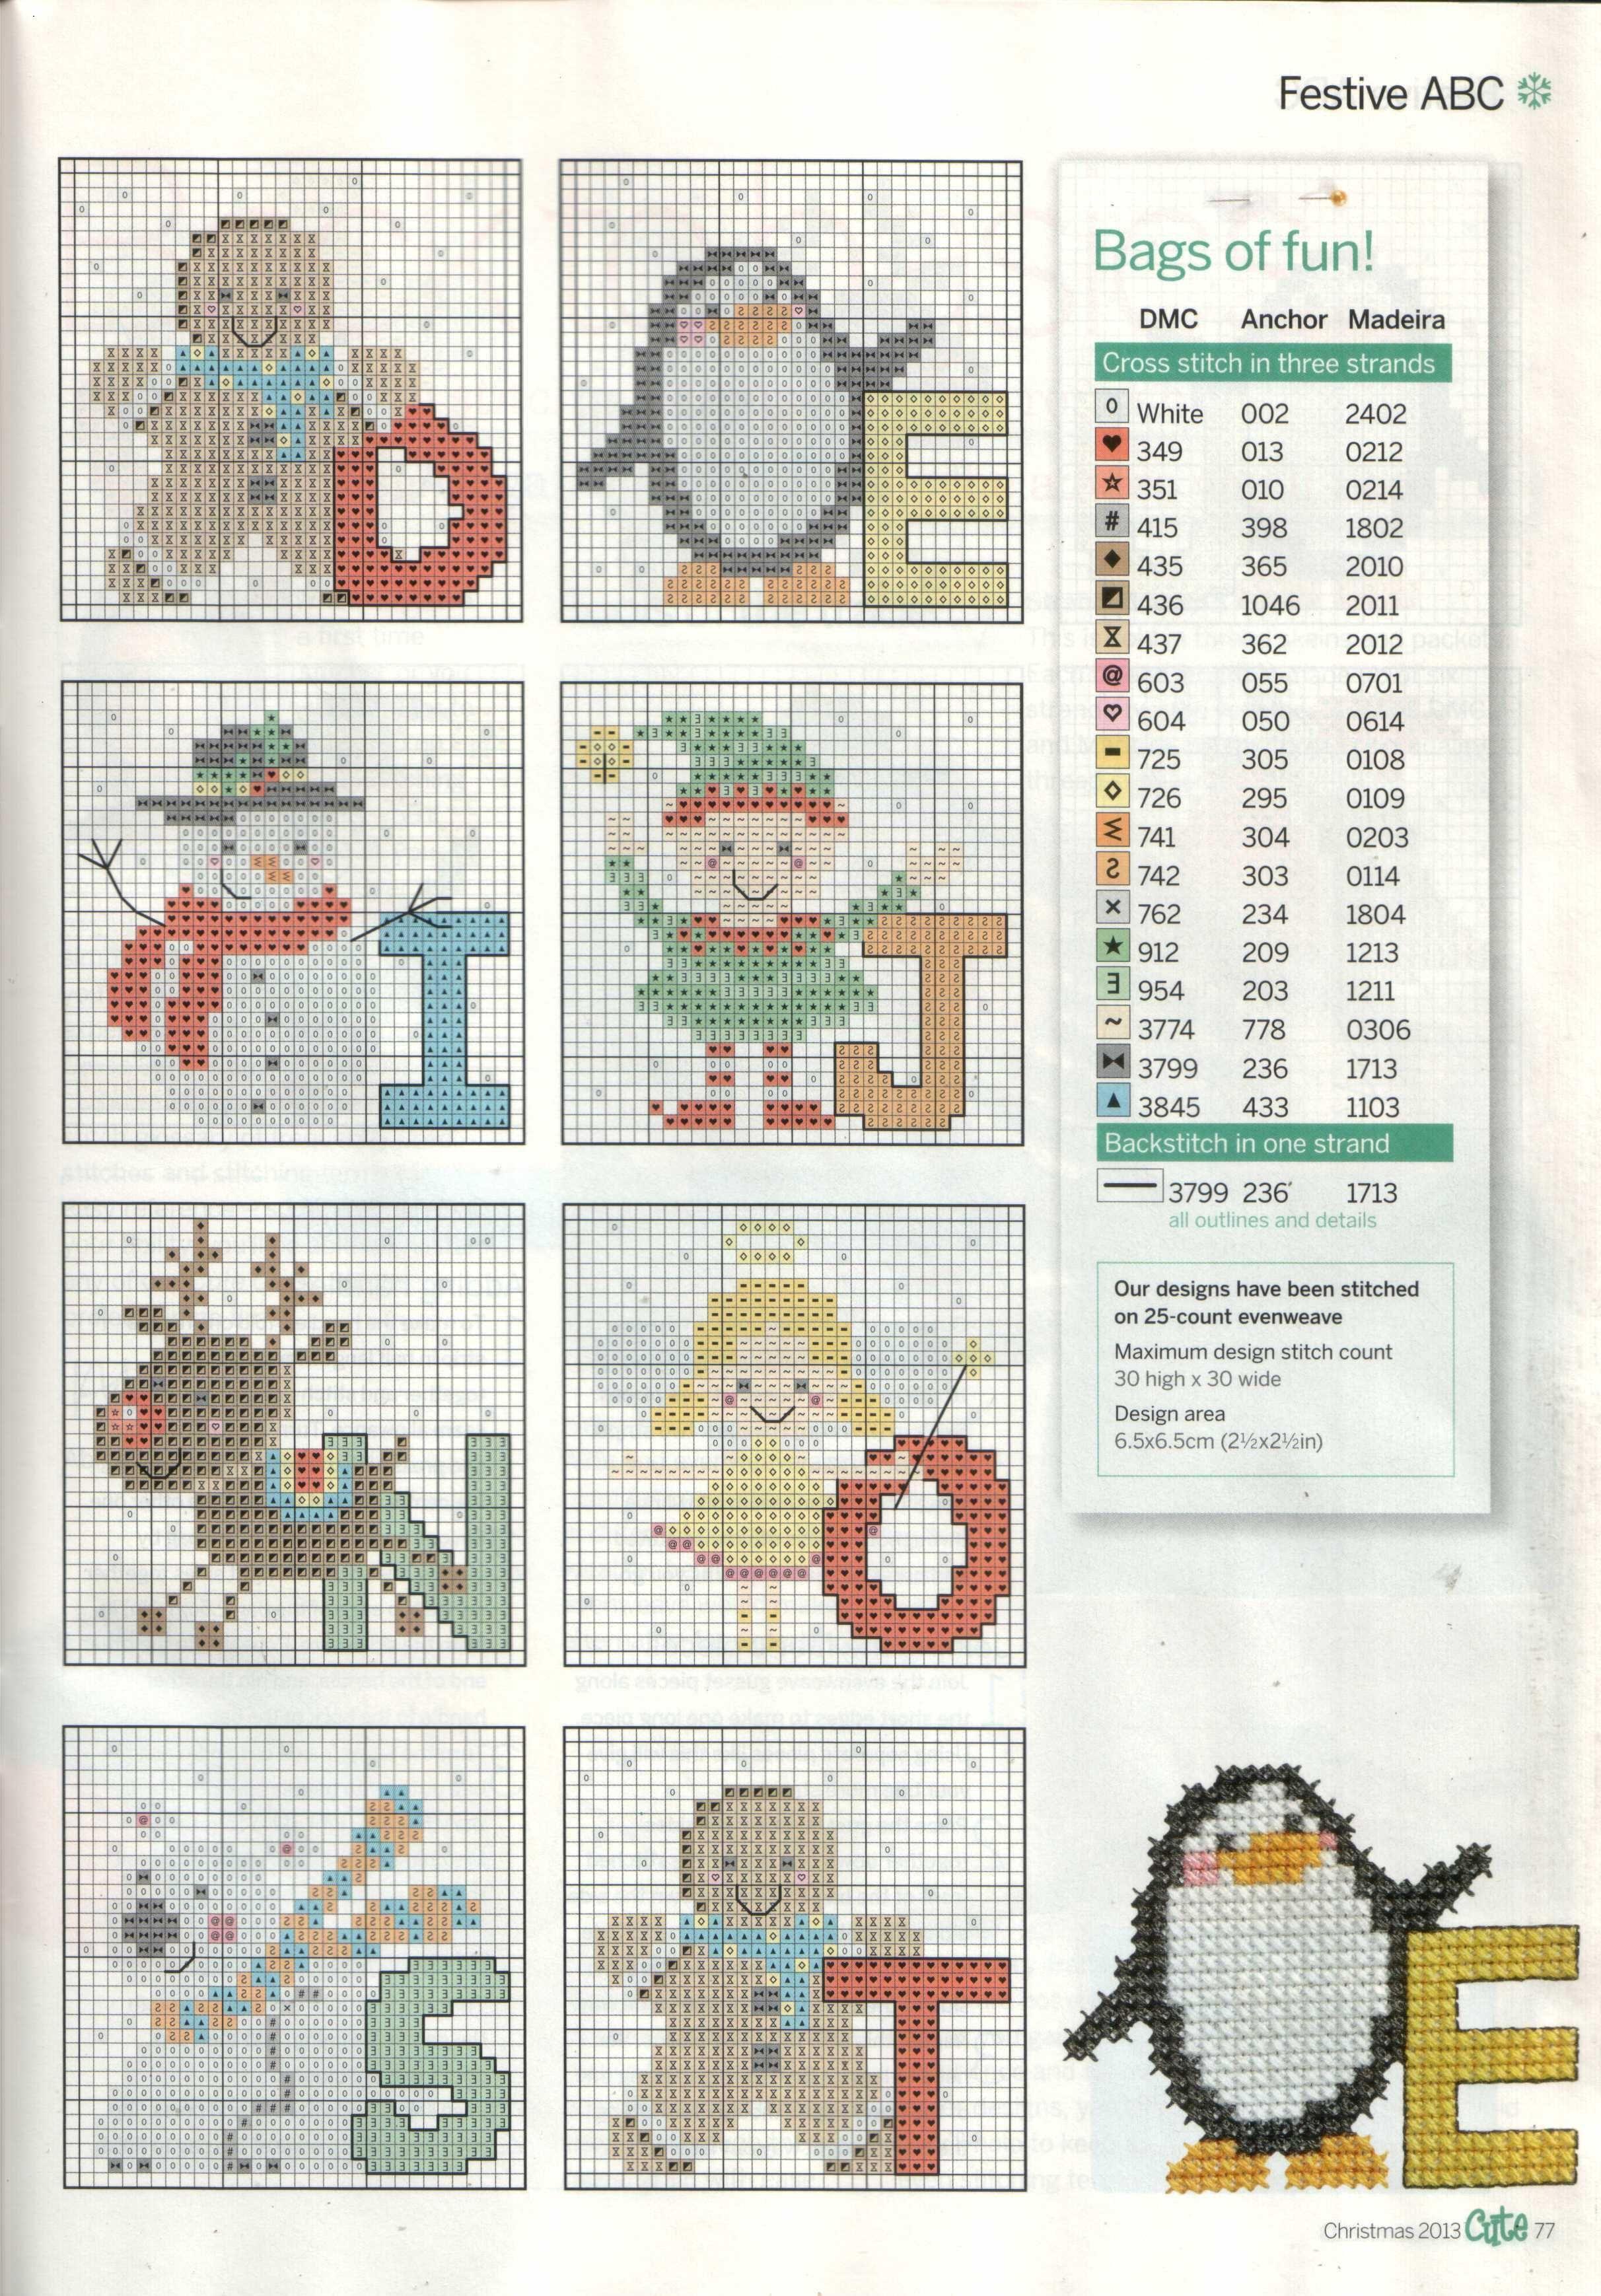 imgbox - fast, simple image host | Cross Stitch - Sets | Pinterest ...